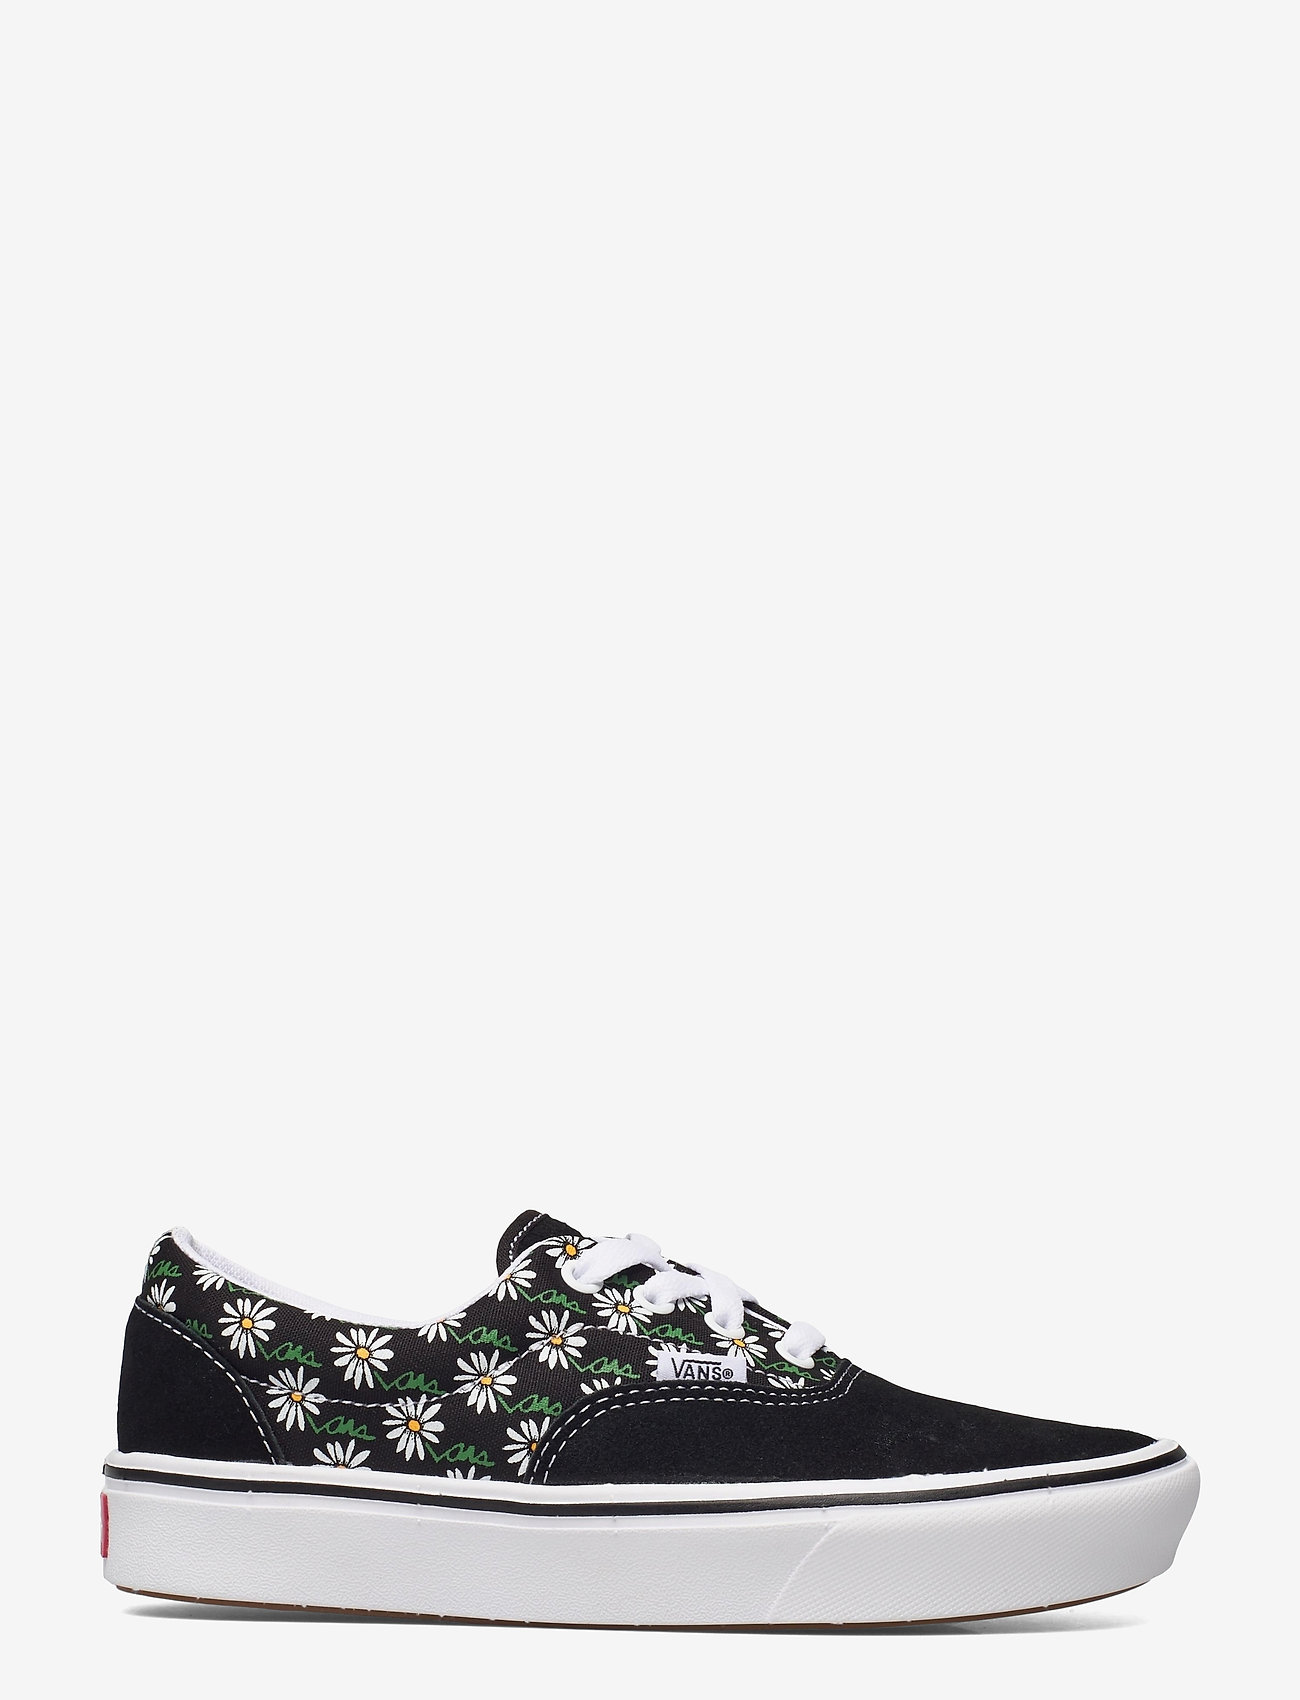 VANS - UA ComfyCush Era - lage sneakers - (scribble flower)daisyblk - 1